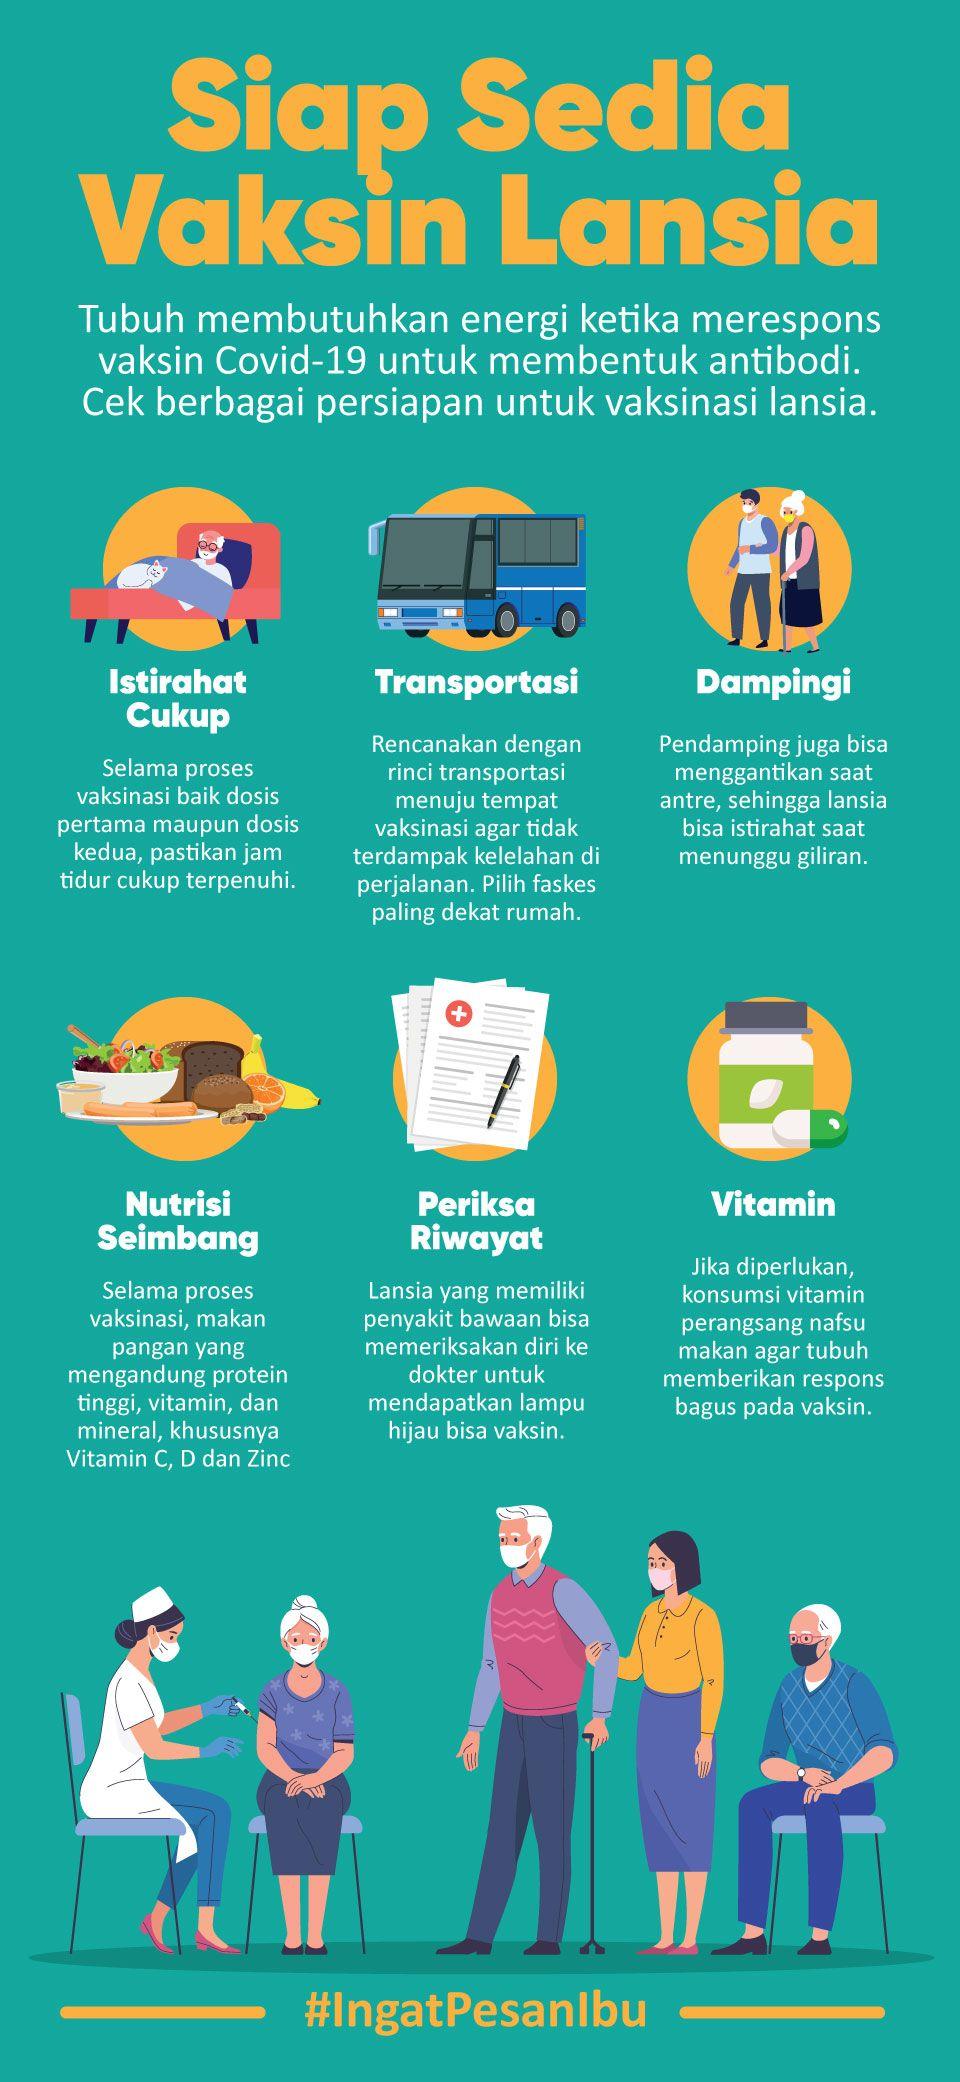 Infografis Siap Sedia Vaksin Lansia